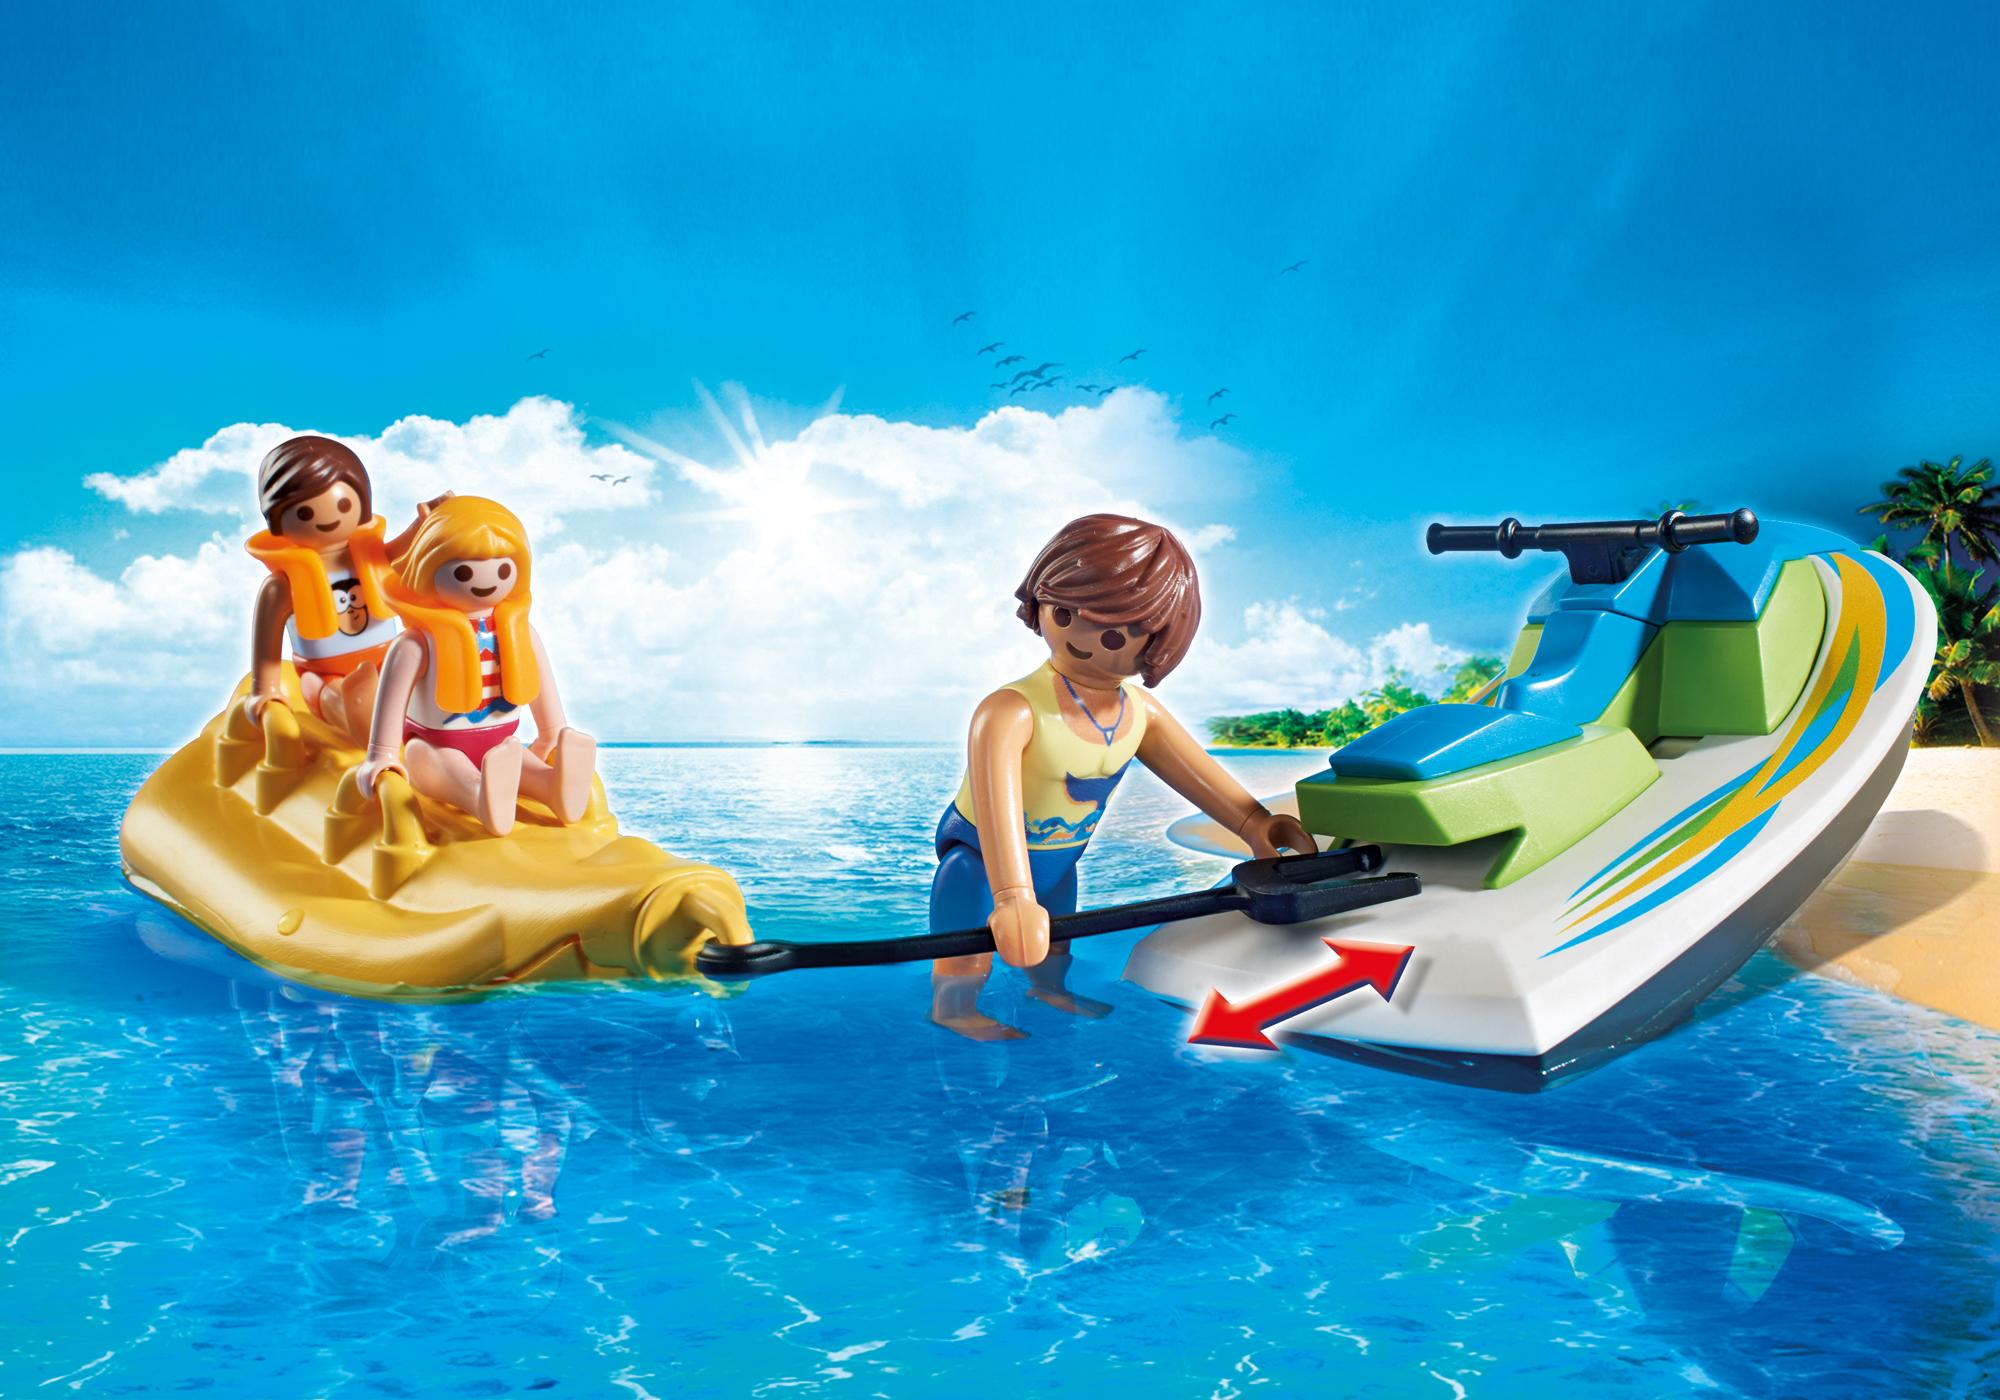 http://media.playmobil.com/i/playmobil/6980_product_extra1/Jetski mit Bananenboot